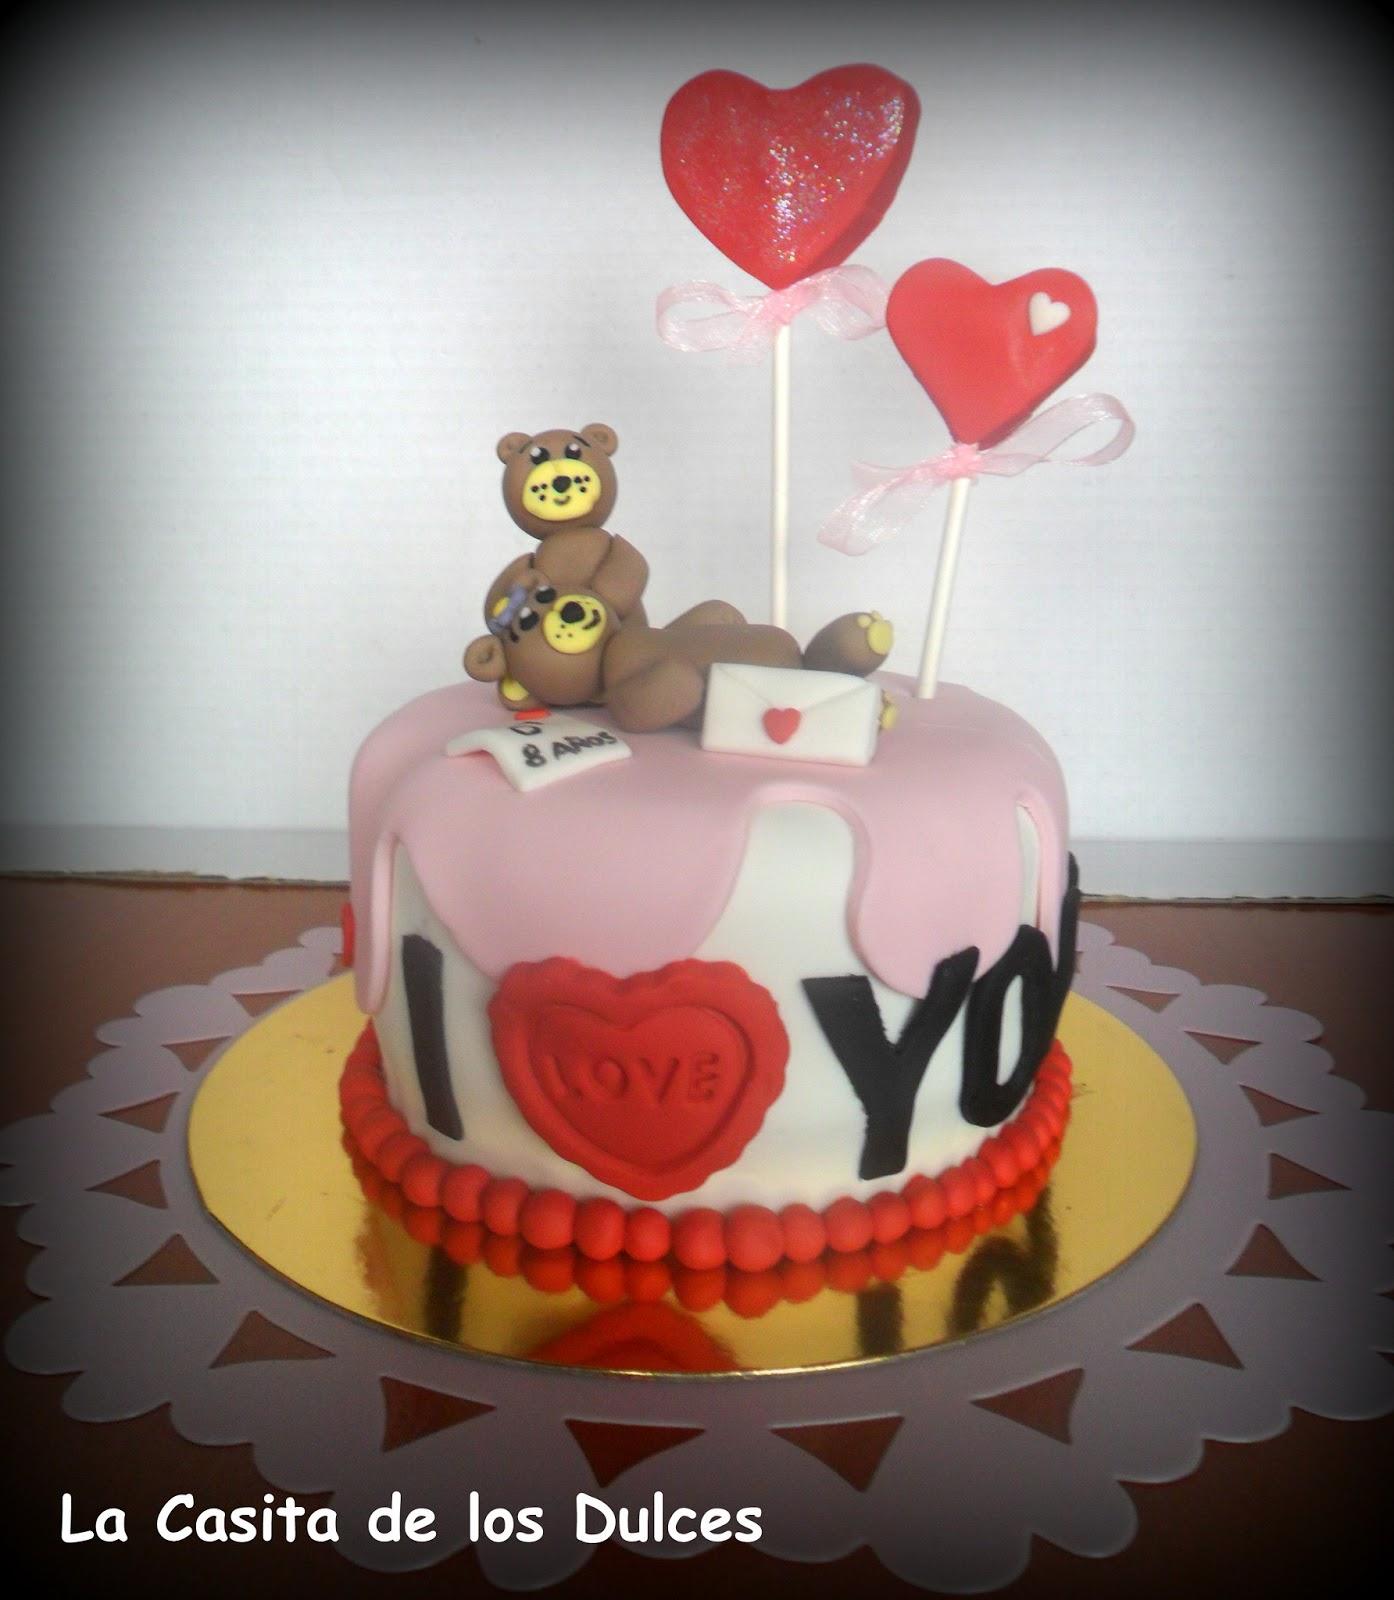 Miss sweet cake tarta fondant 8 aniversario - Como sorprender a mi pareja en su cumpleanos ...